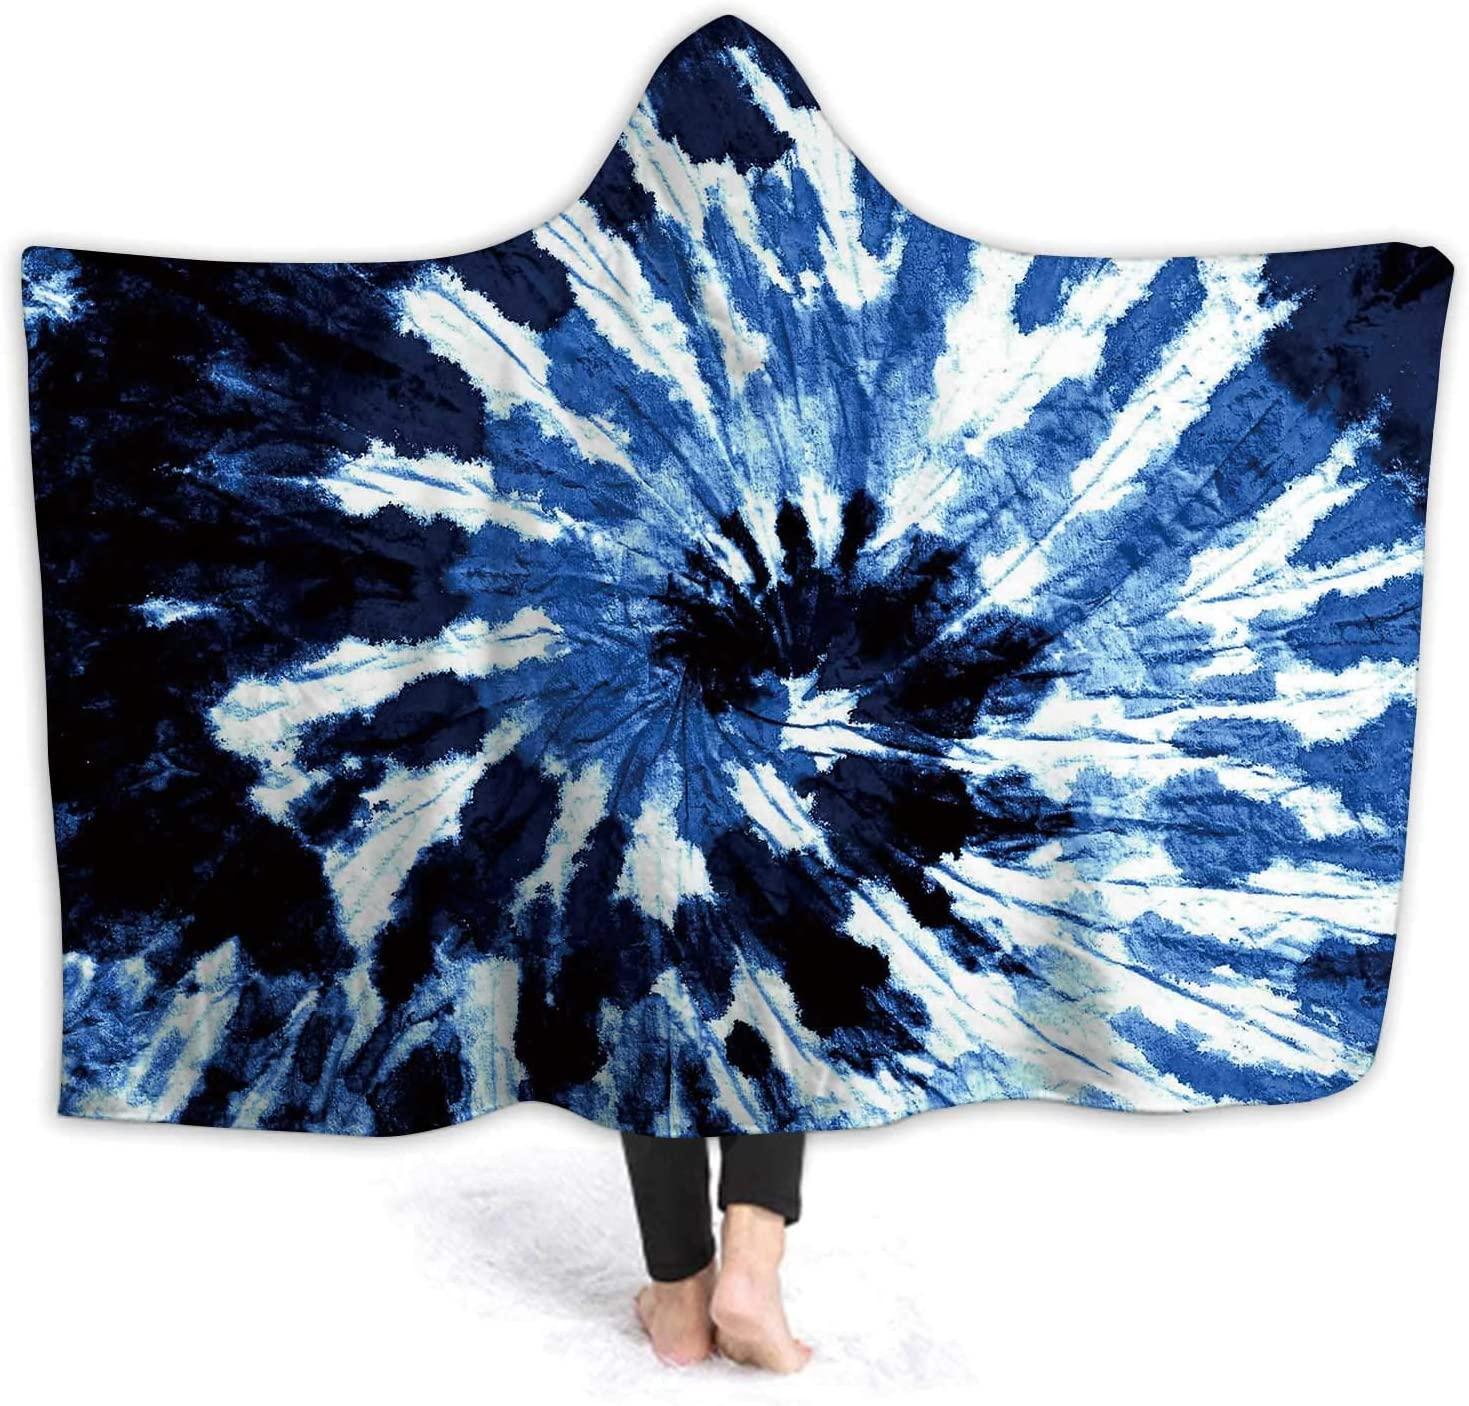 Hitecera Tie de Pattern.Hand Drawn Blue Shibori Print.Ink Textured Japanese -.Modern Batik Wallpaper Paper.Template.Marble,Hooded Blanket Anti-Pilling Flannel Blanket suminagashi S 50''x40''(WxH)